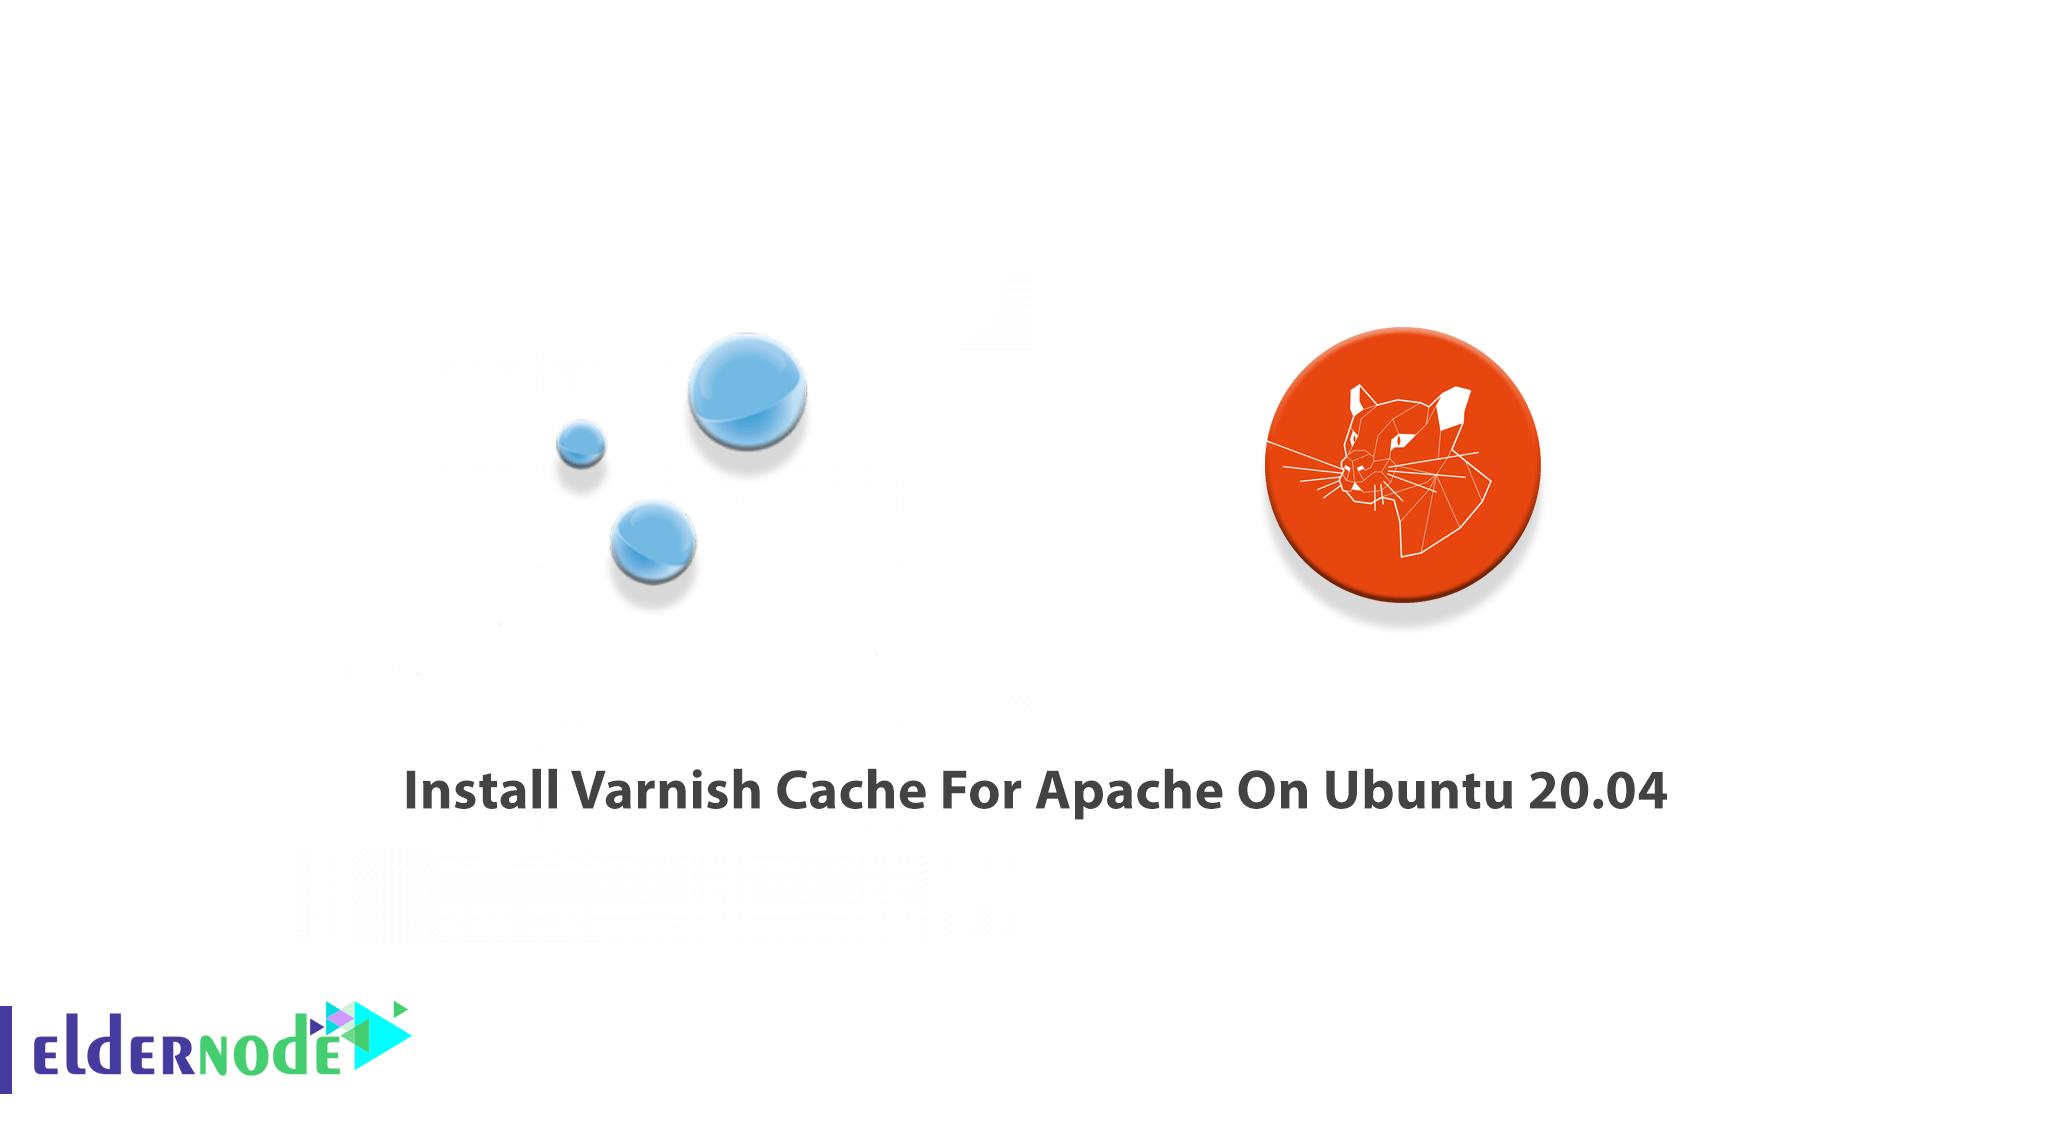 Install Varnish Cache For Apache On Ubuntu 20.04